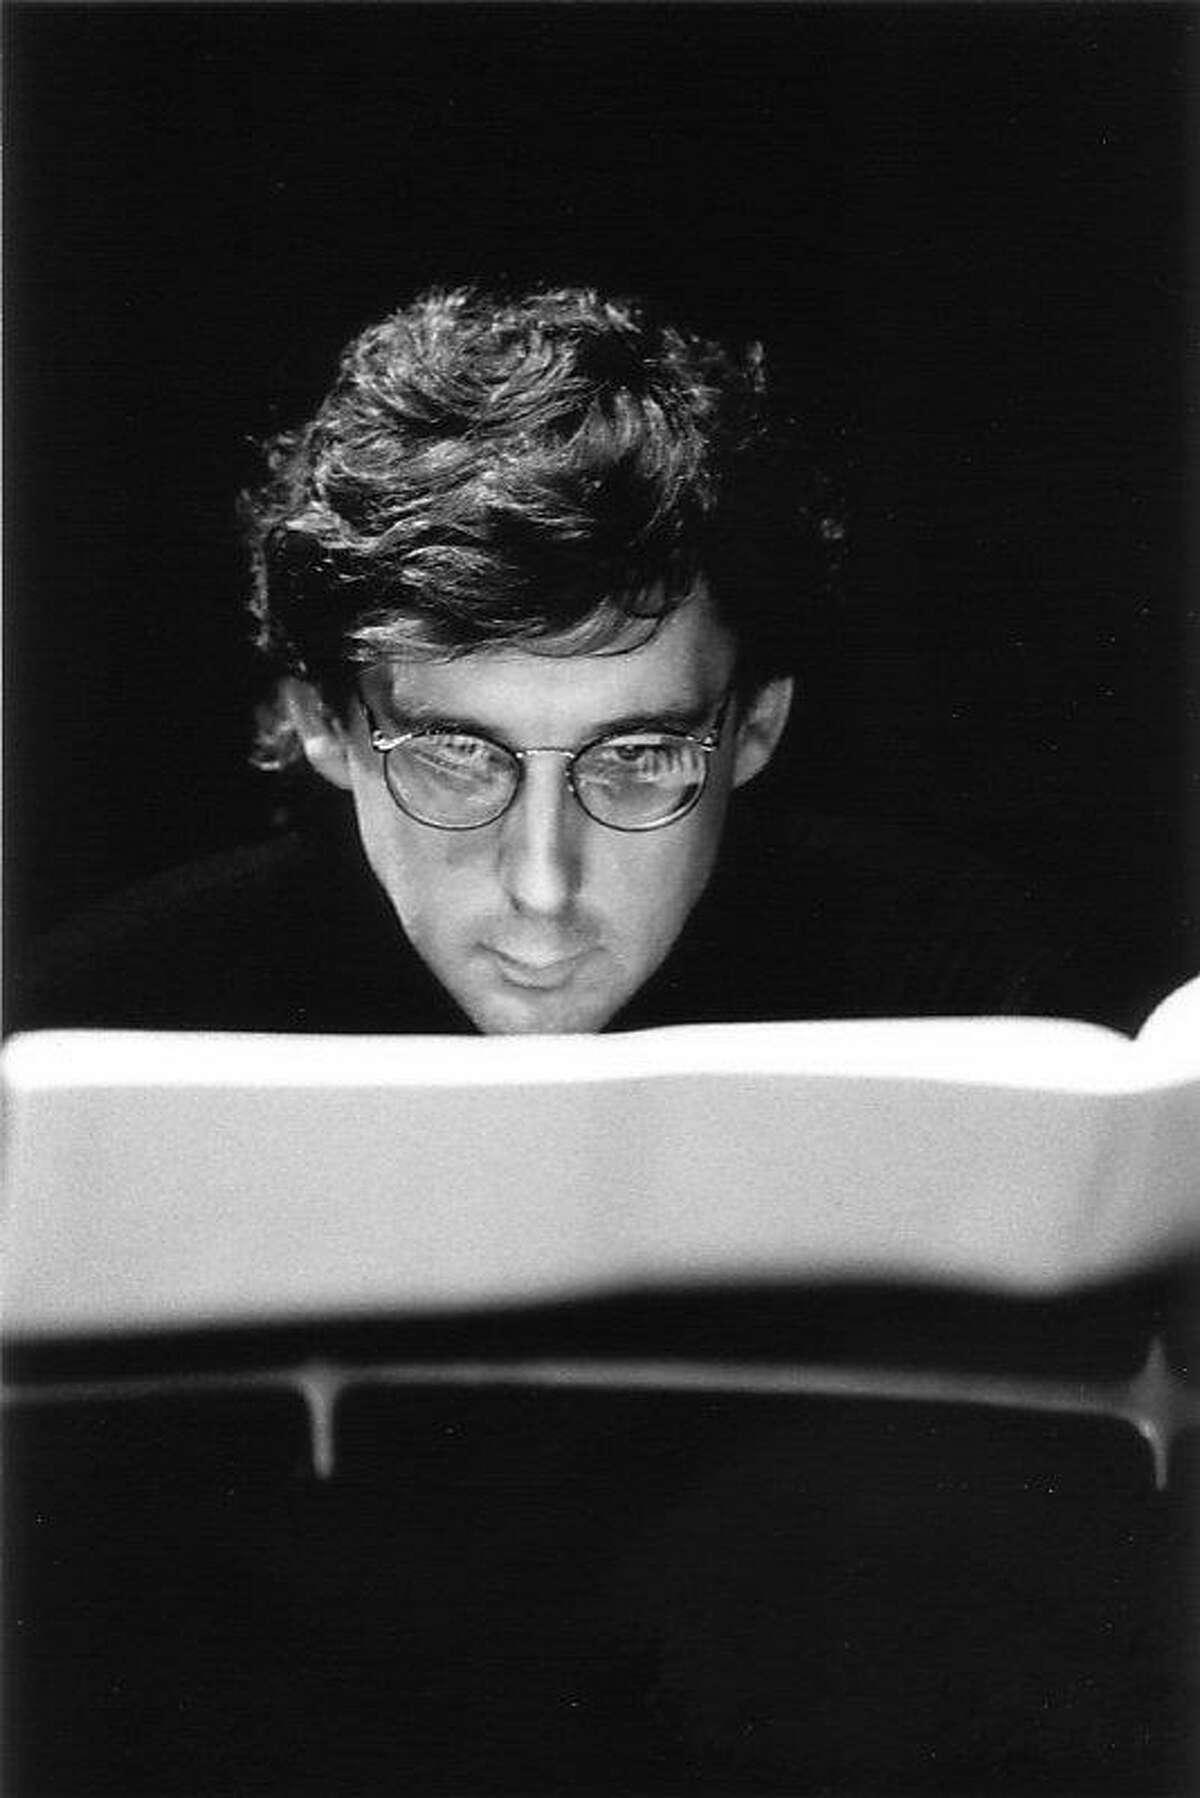 Pianist Thomas Schultz